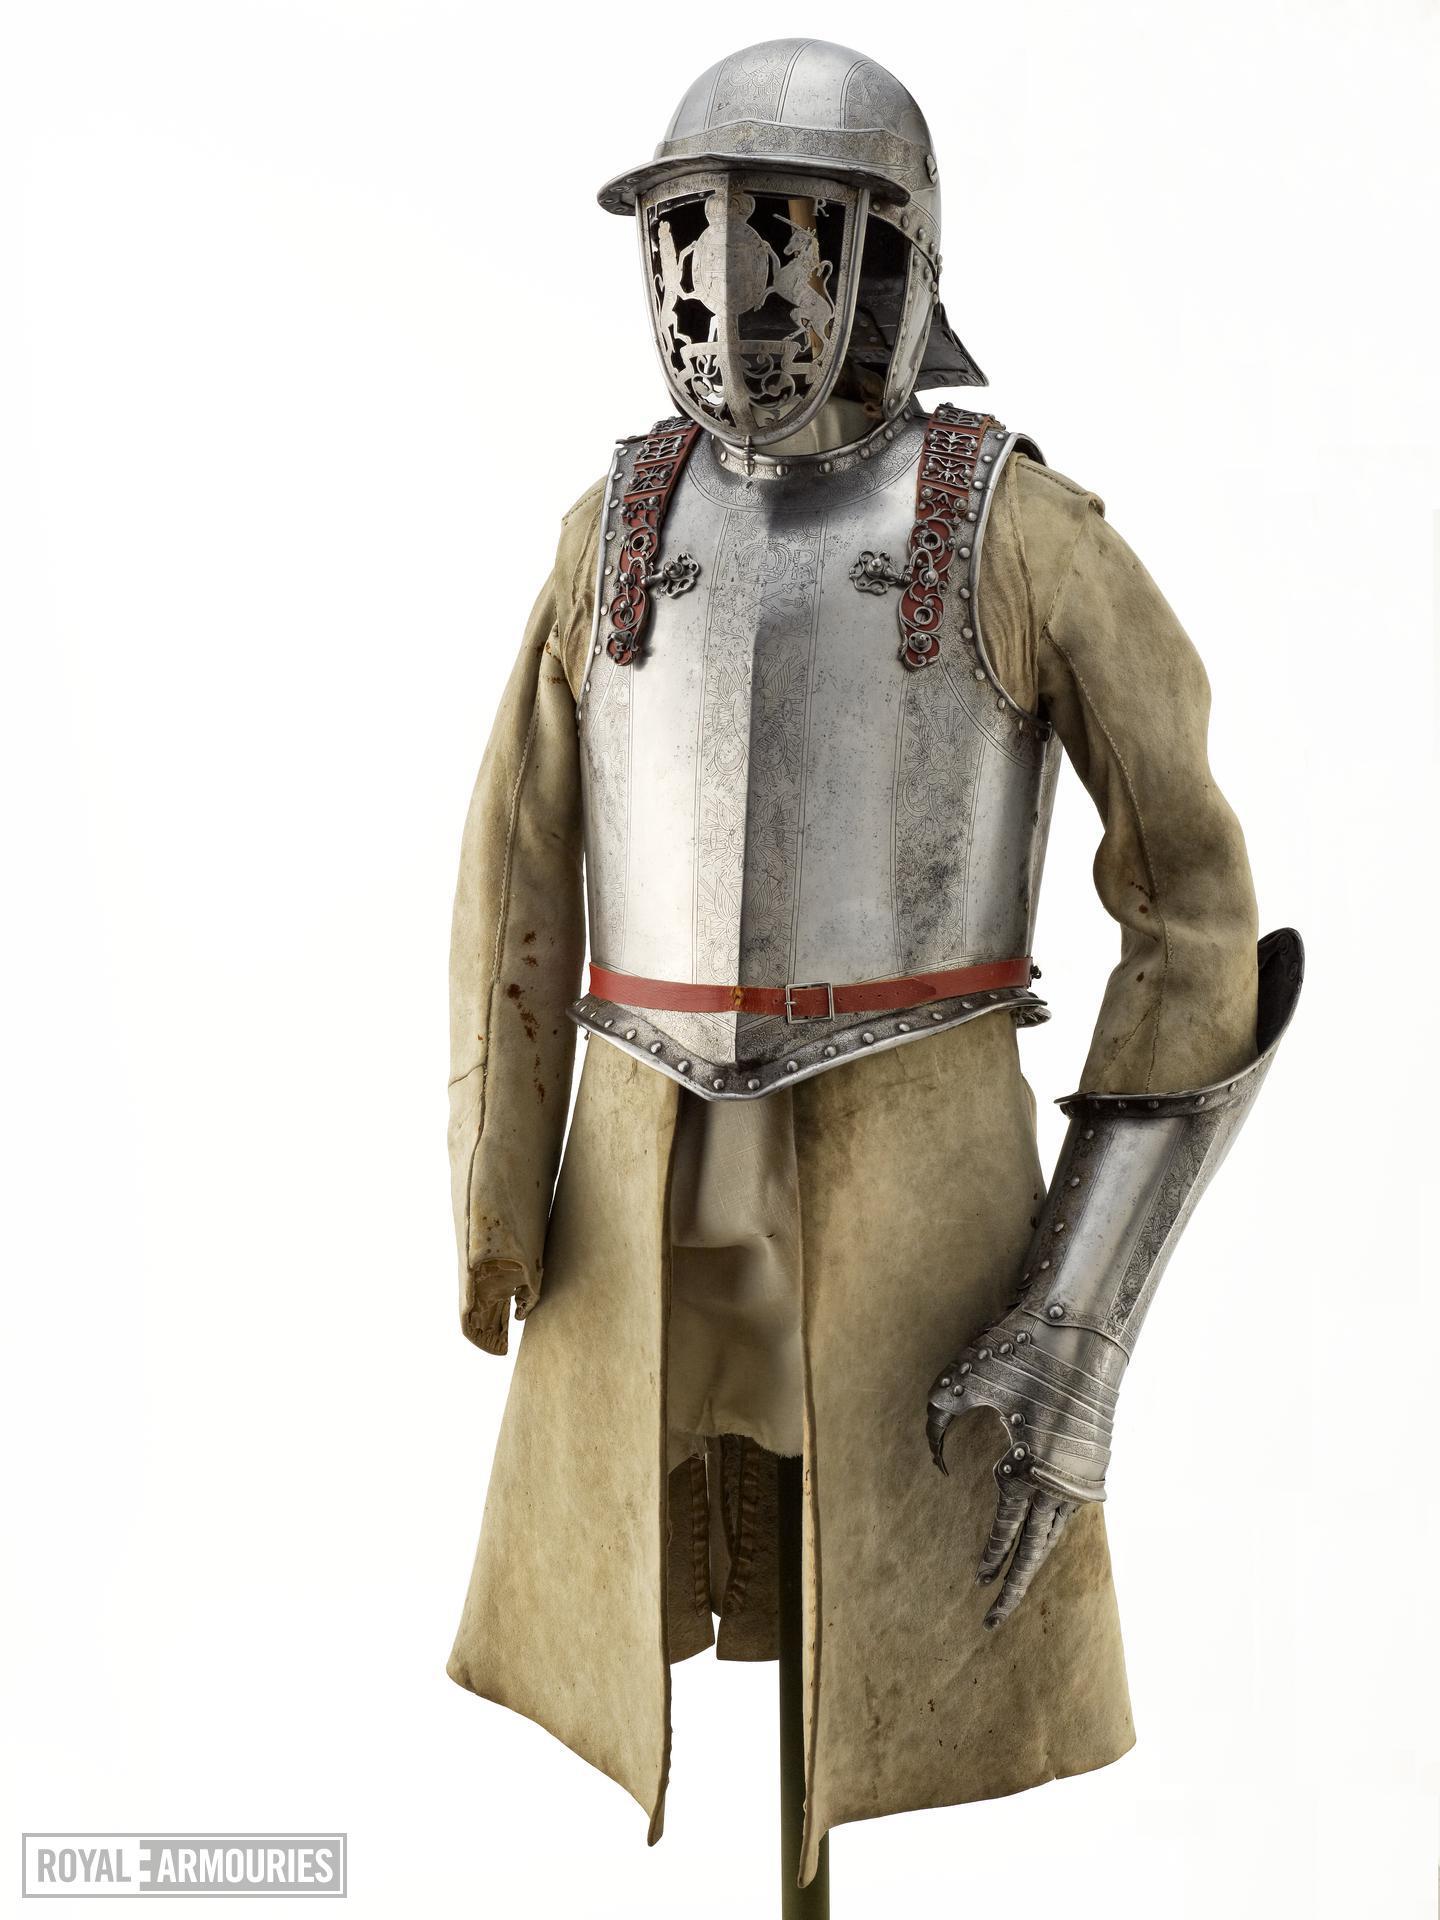 Armour - Armour of King James II